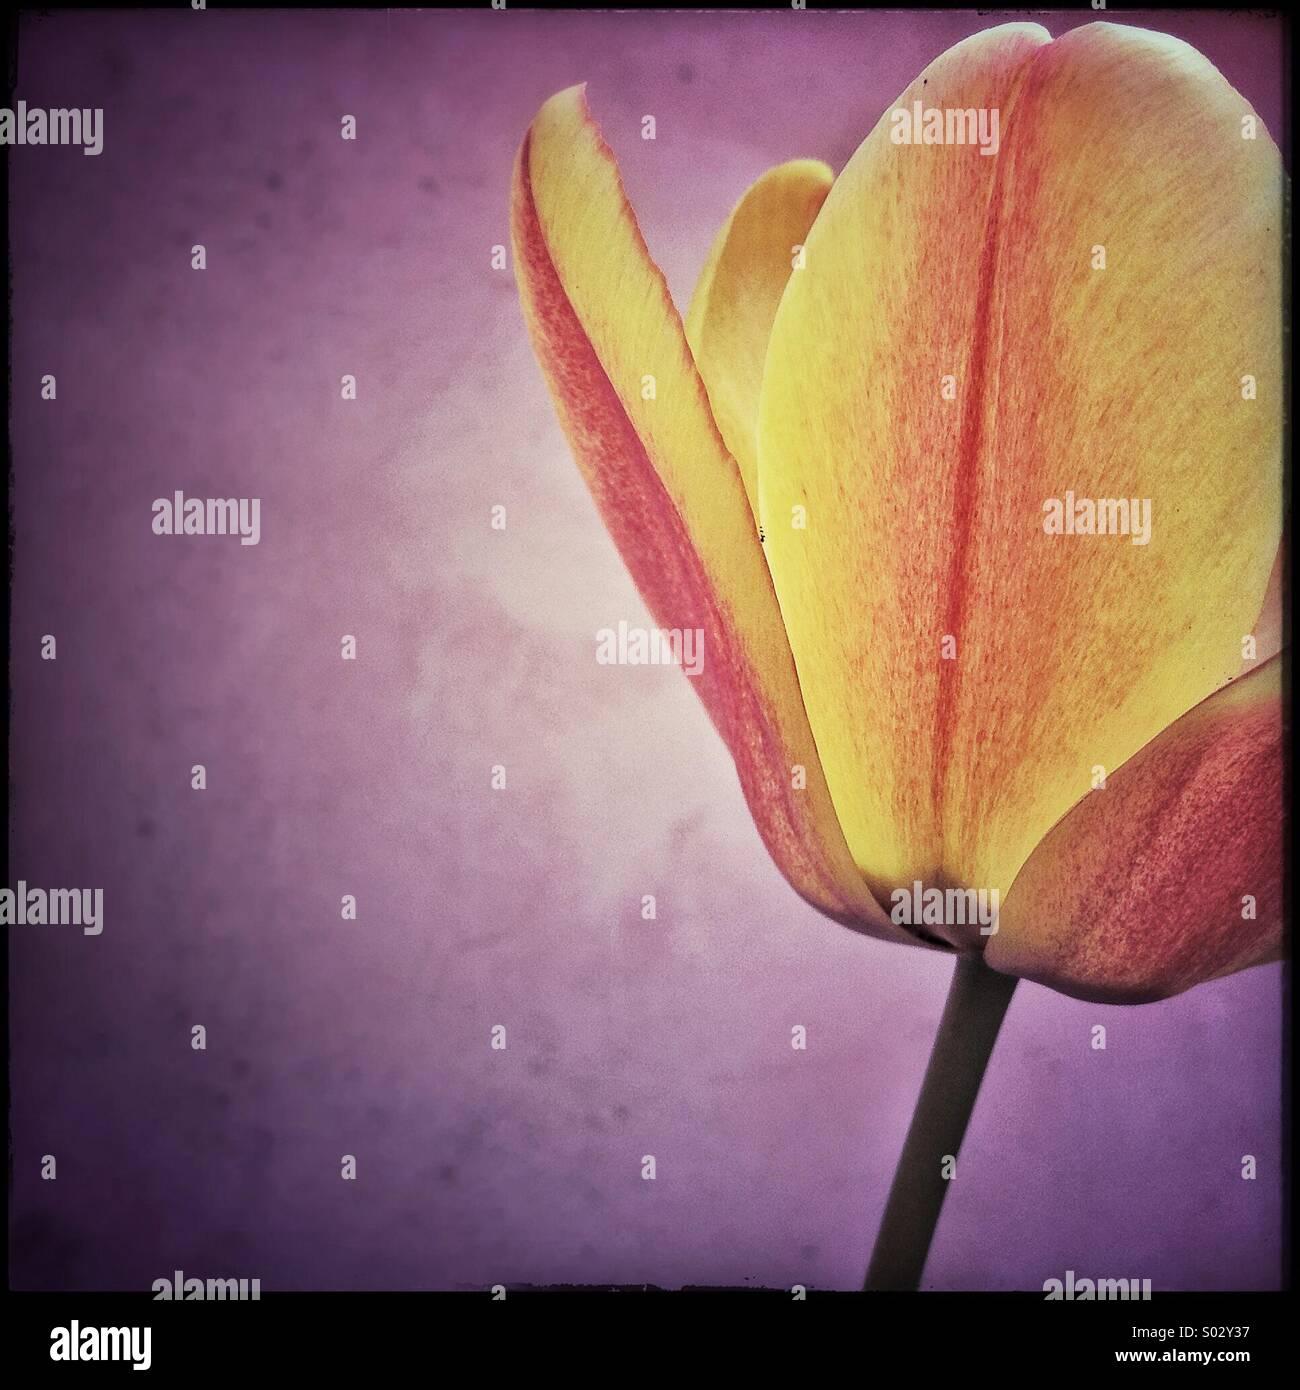 Tulip flower - Stock Image